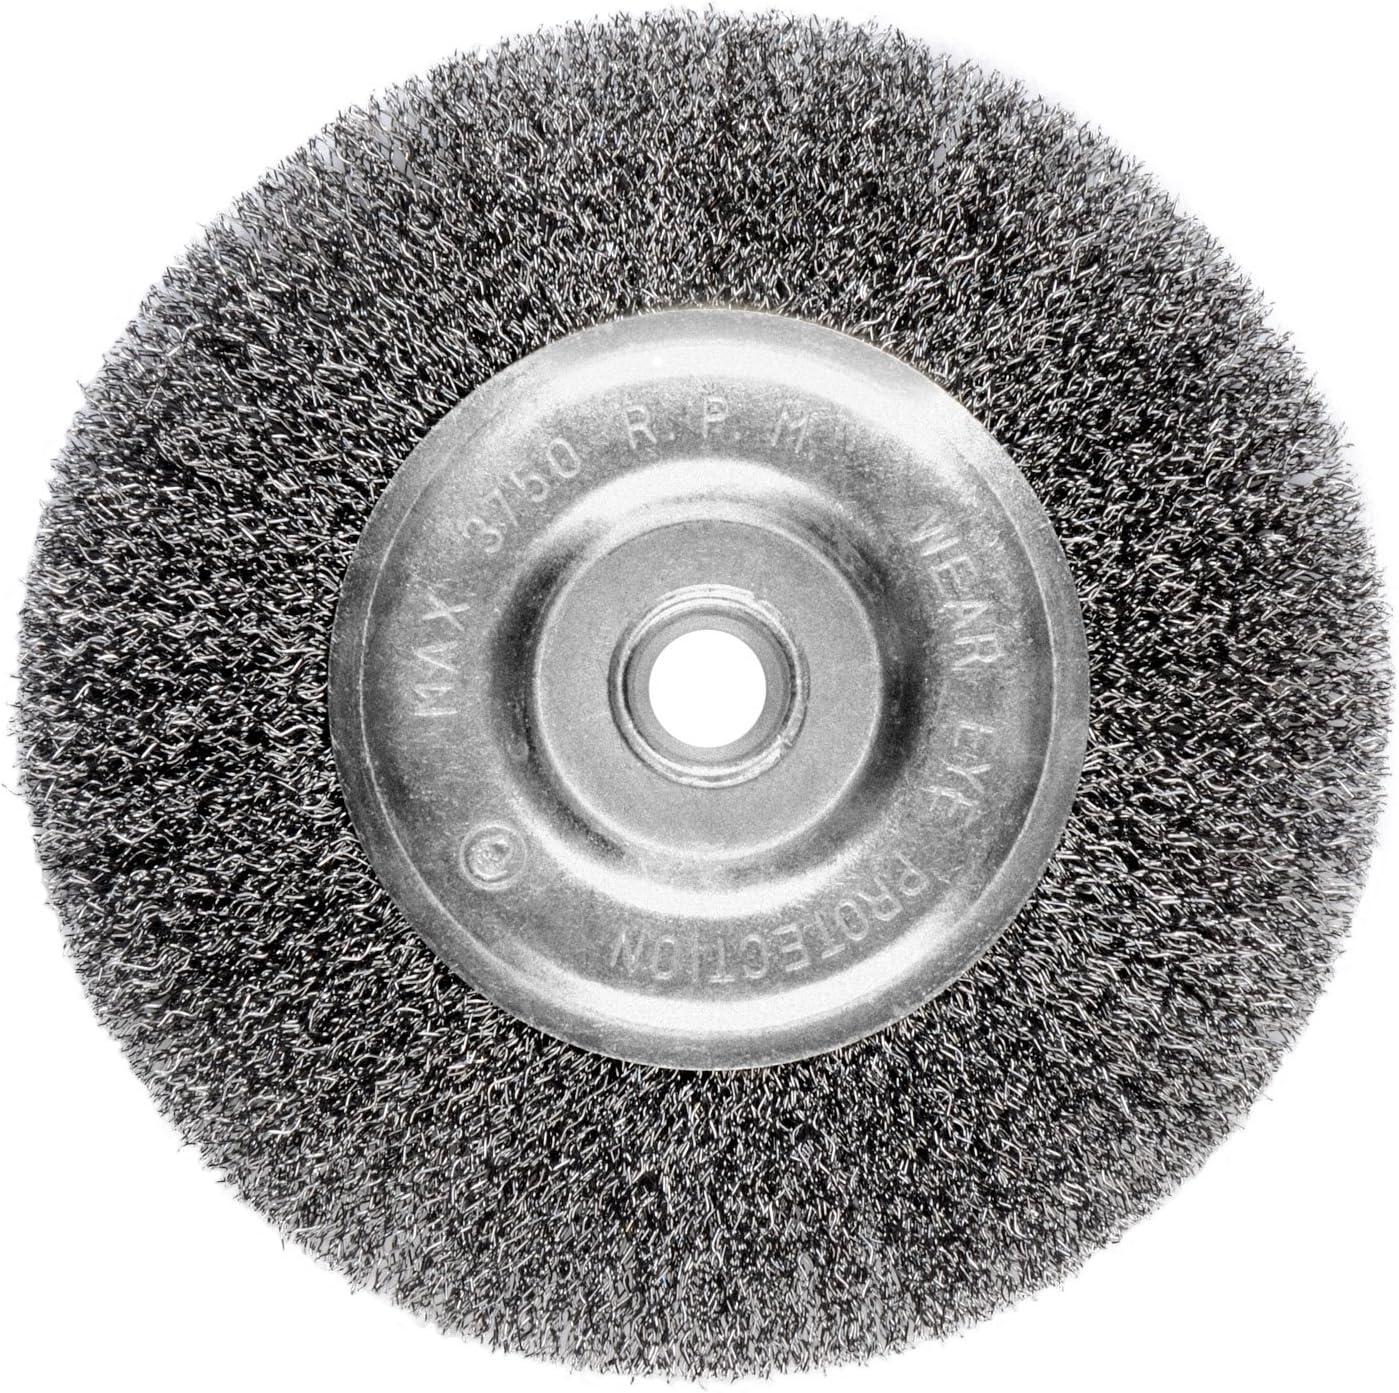 6-Inch Bench Grinder Wire Bench Wheel Brush Fine Crimped with 1//2Inch 5//8Inch